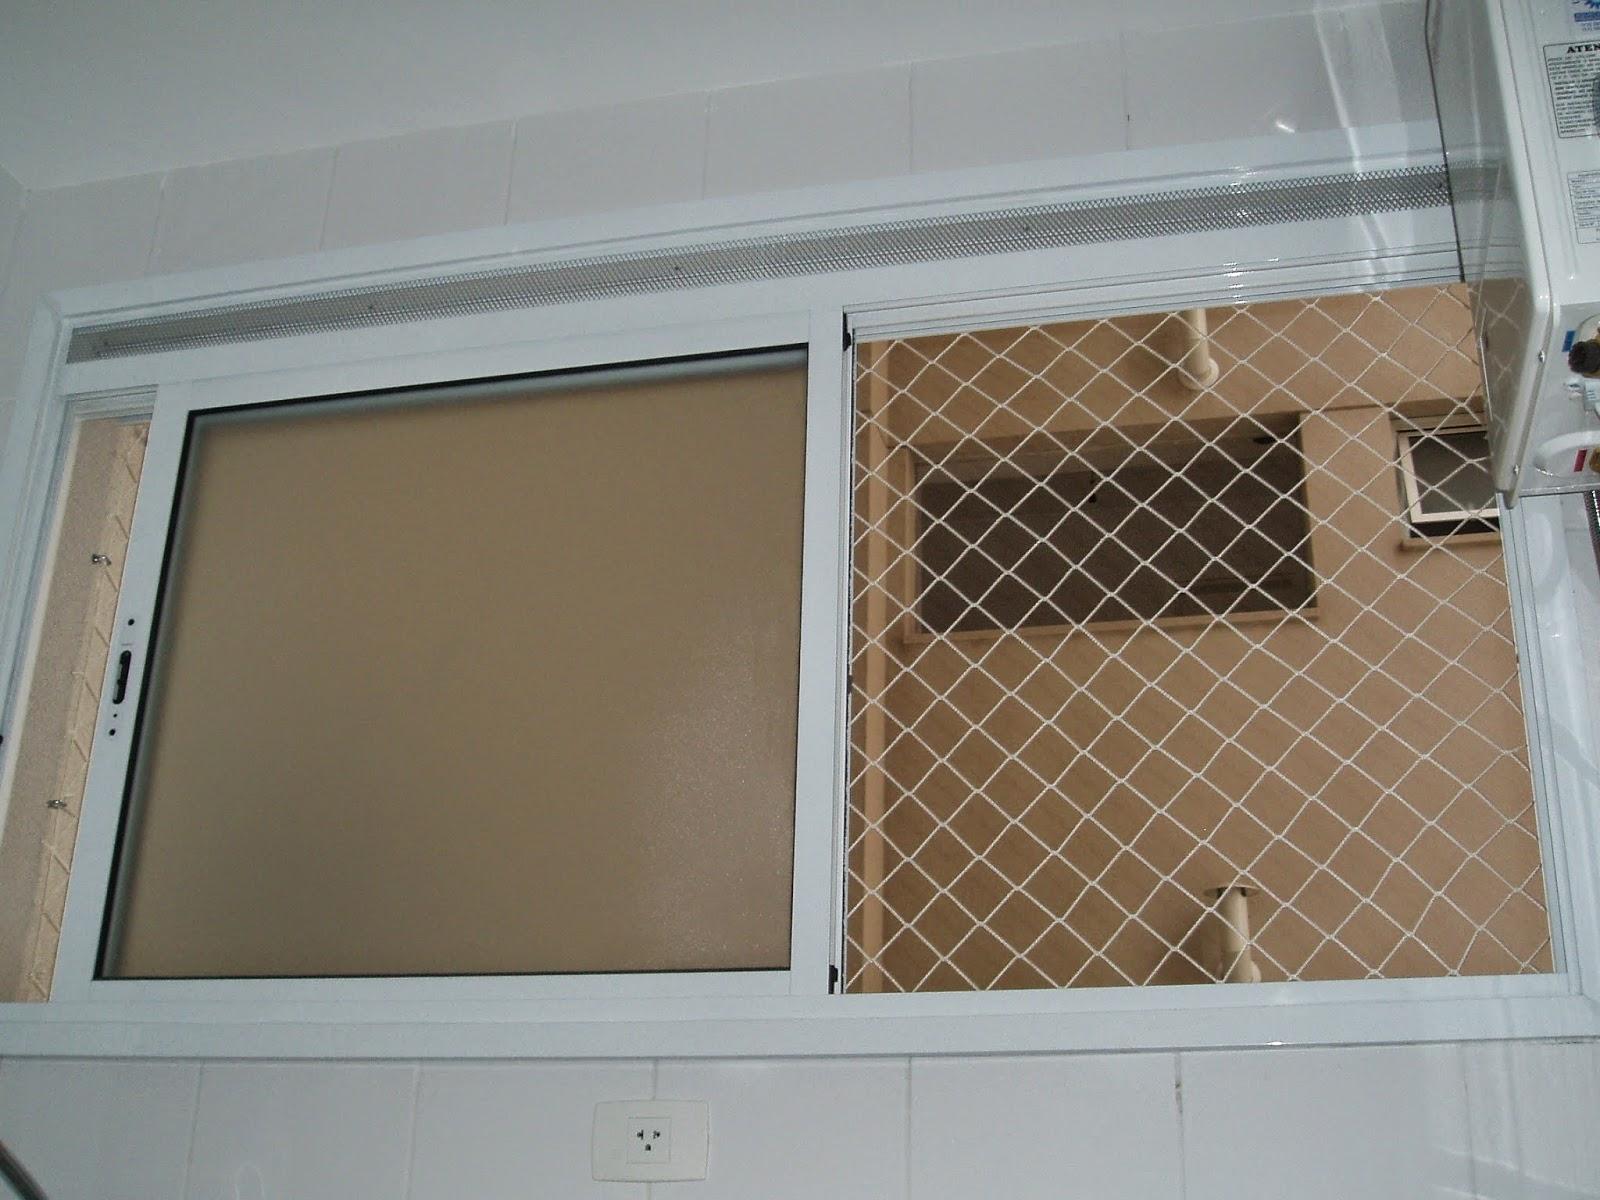 #654E35 Posted in: compras janela reforma 1654 Janela De Aluminio Linha 25